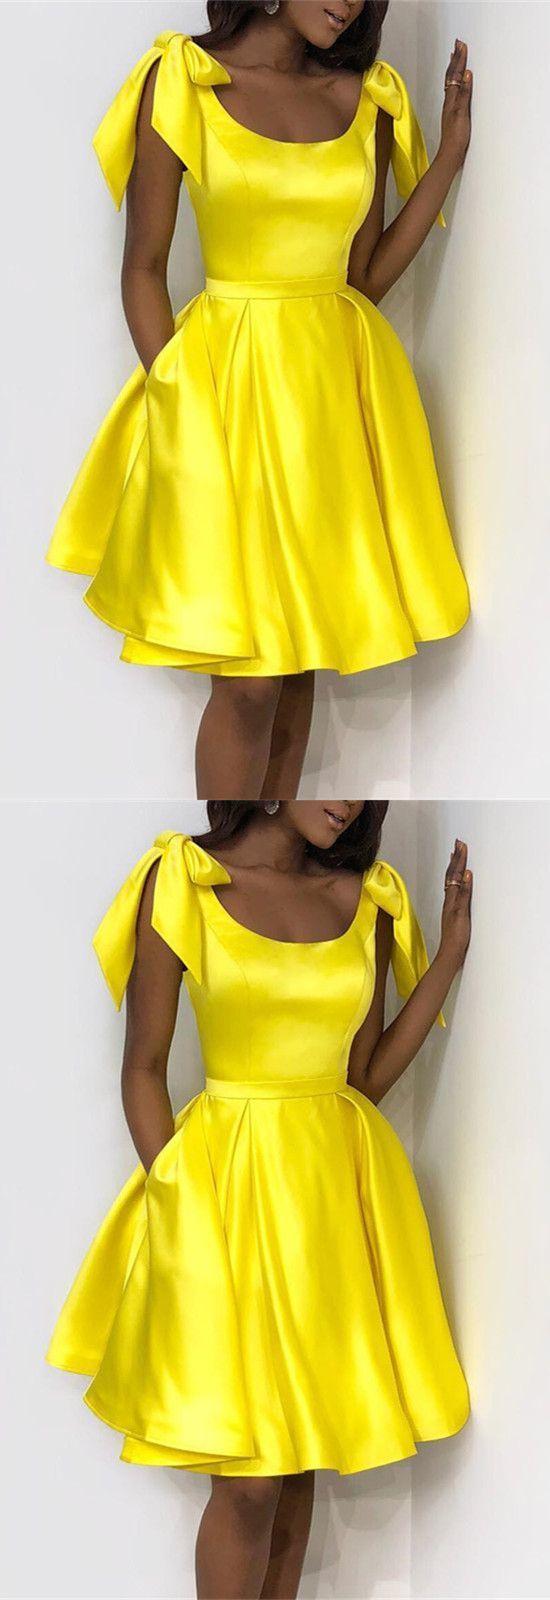 Yellow Bow Shoulder Satin Homecoming Dresses BD2135